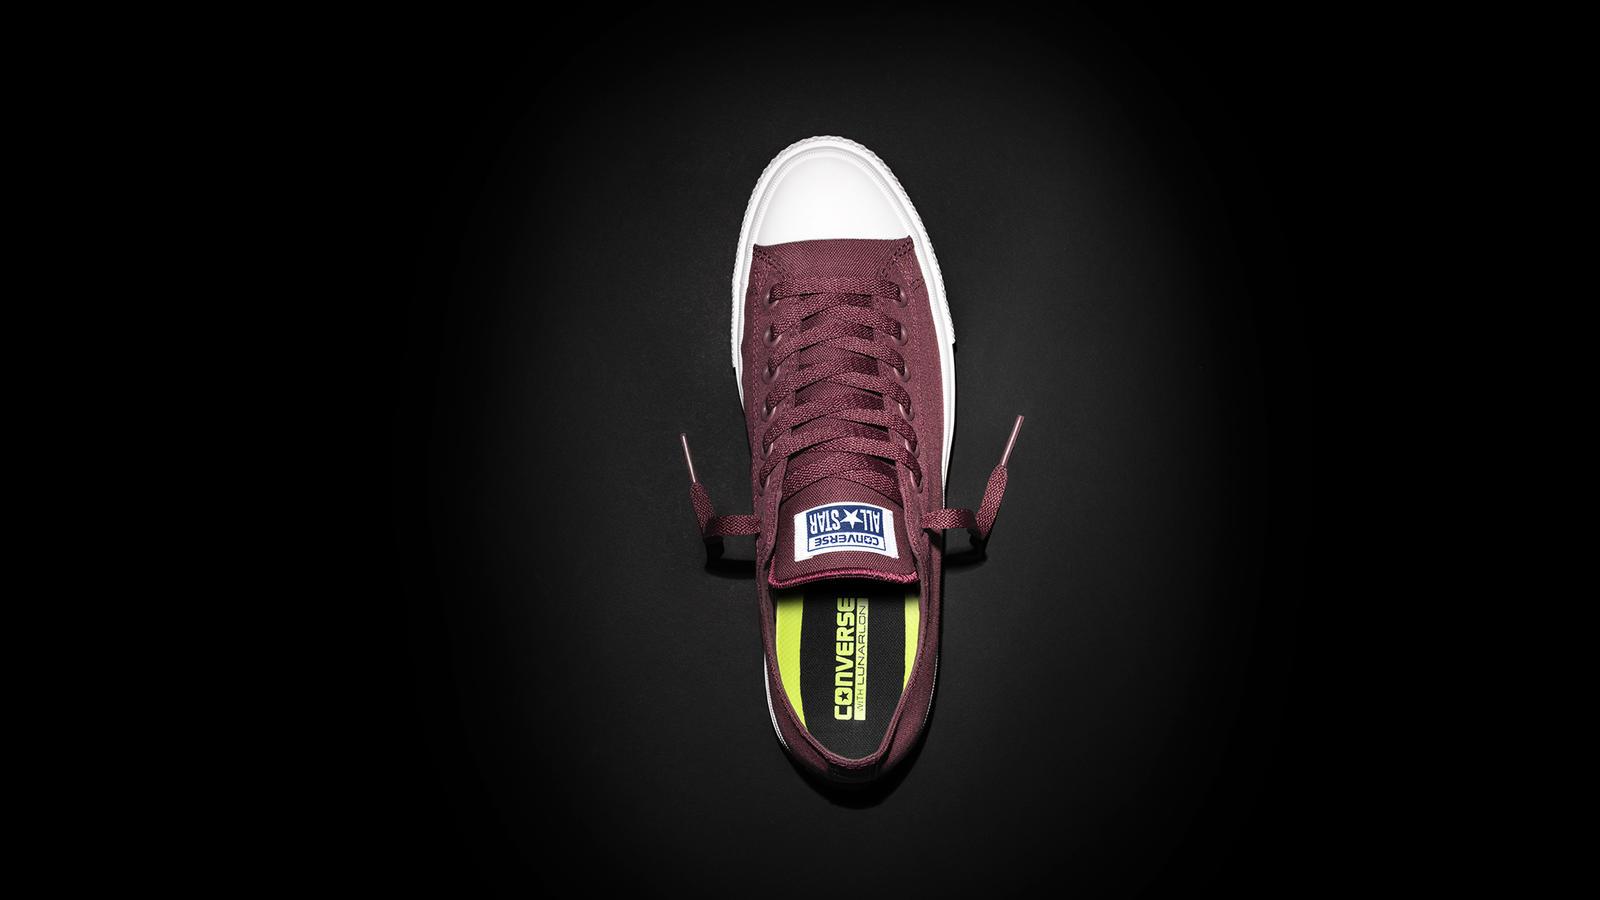 469f387456b851 CONVERSE CHUCK TAYLOR ALL STAR II UNVEILS NEW SEASONAL COLORS - Nike ...